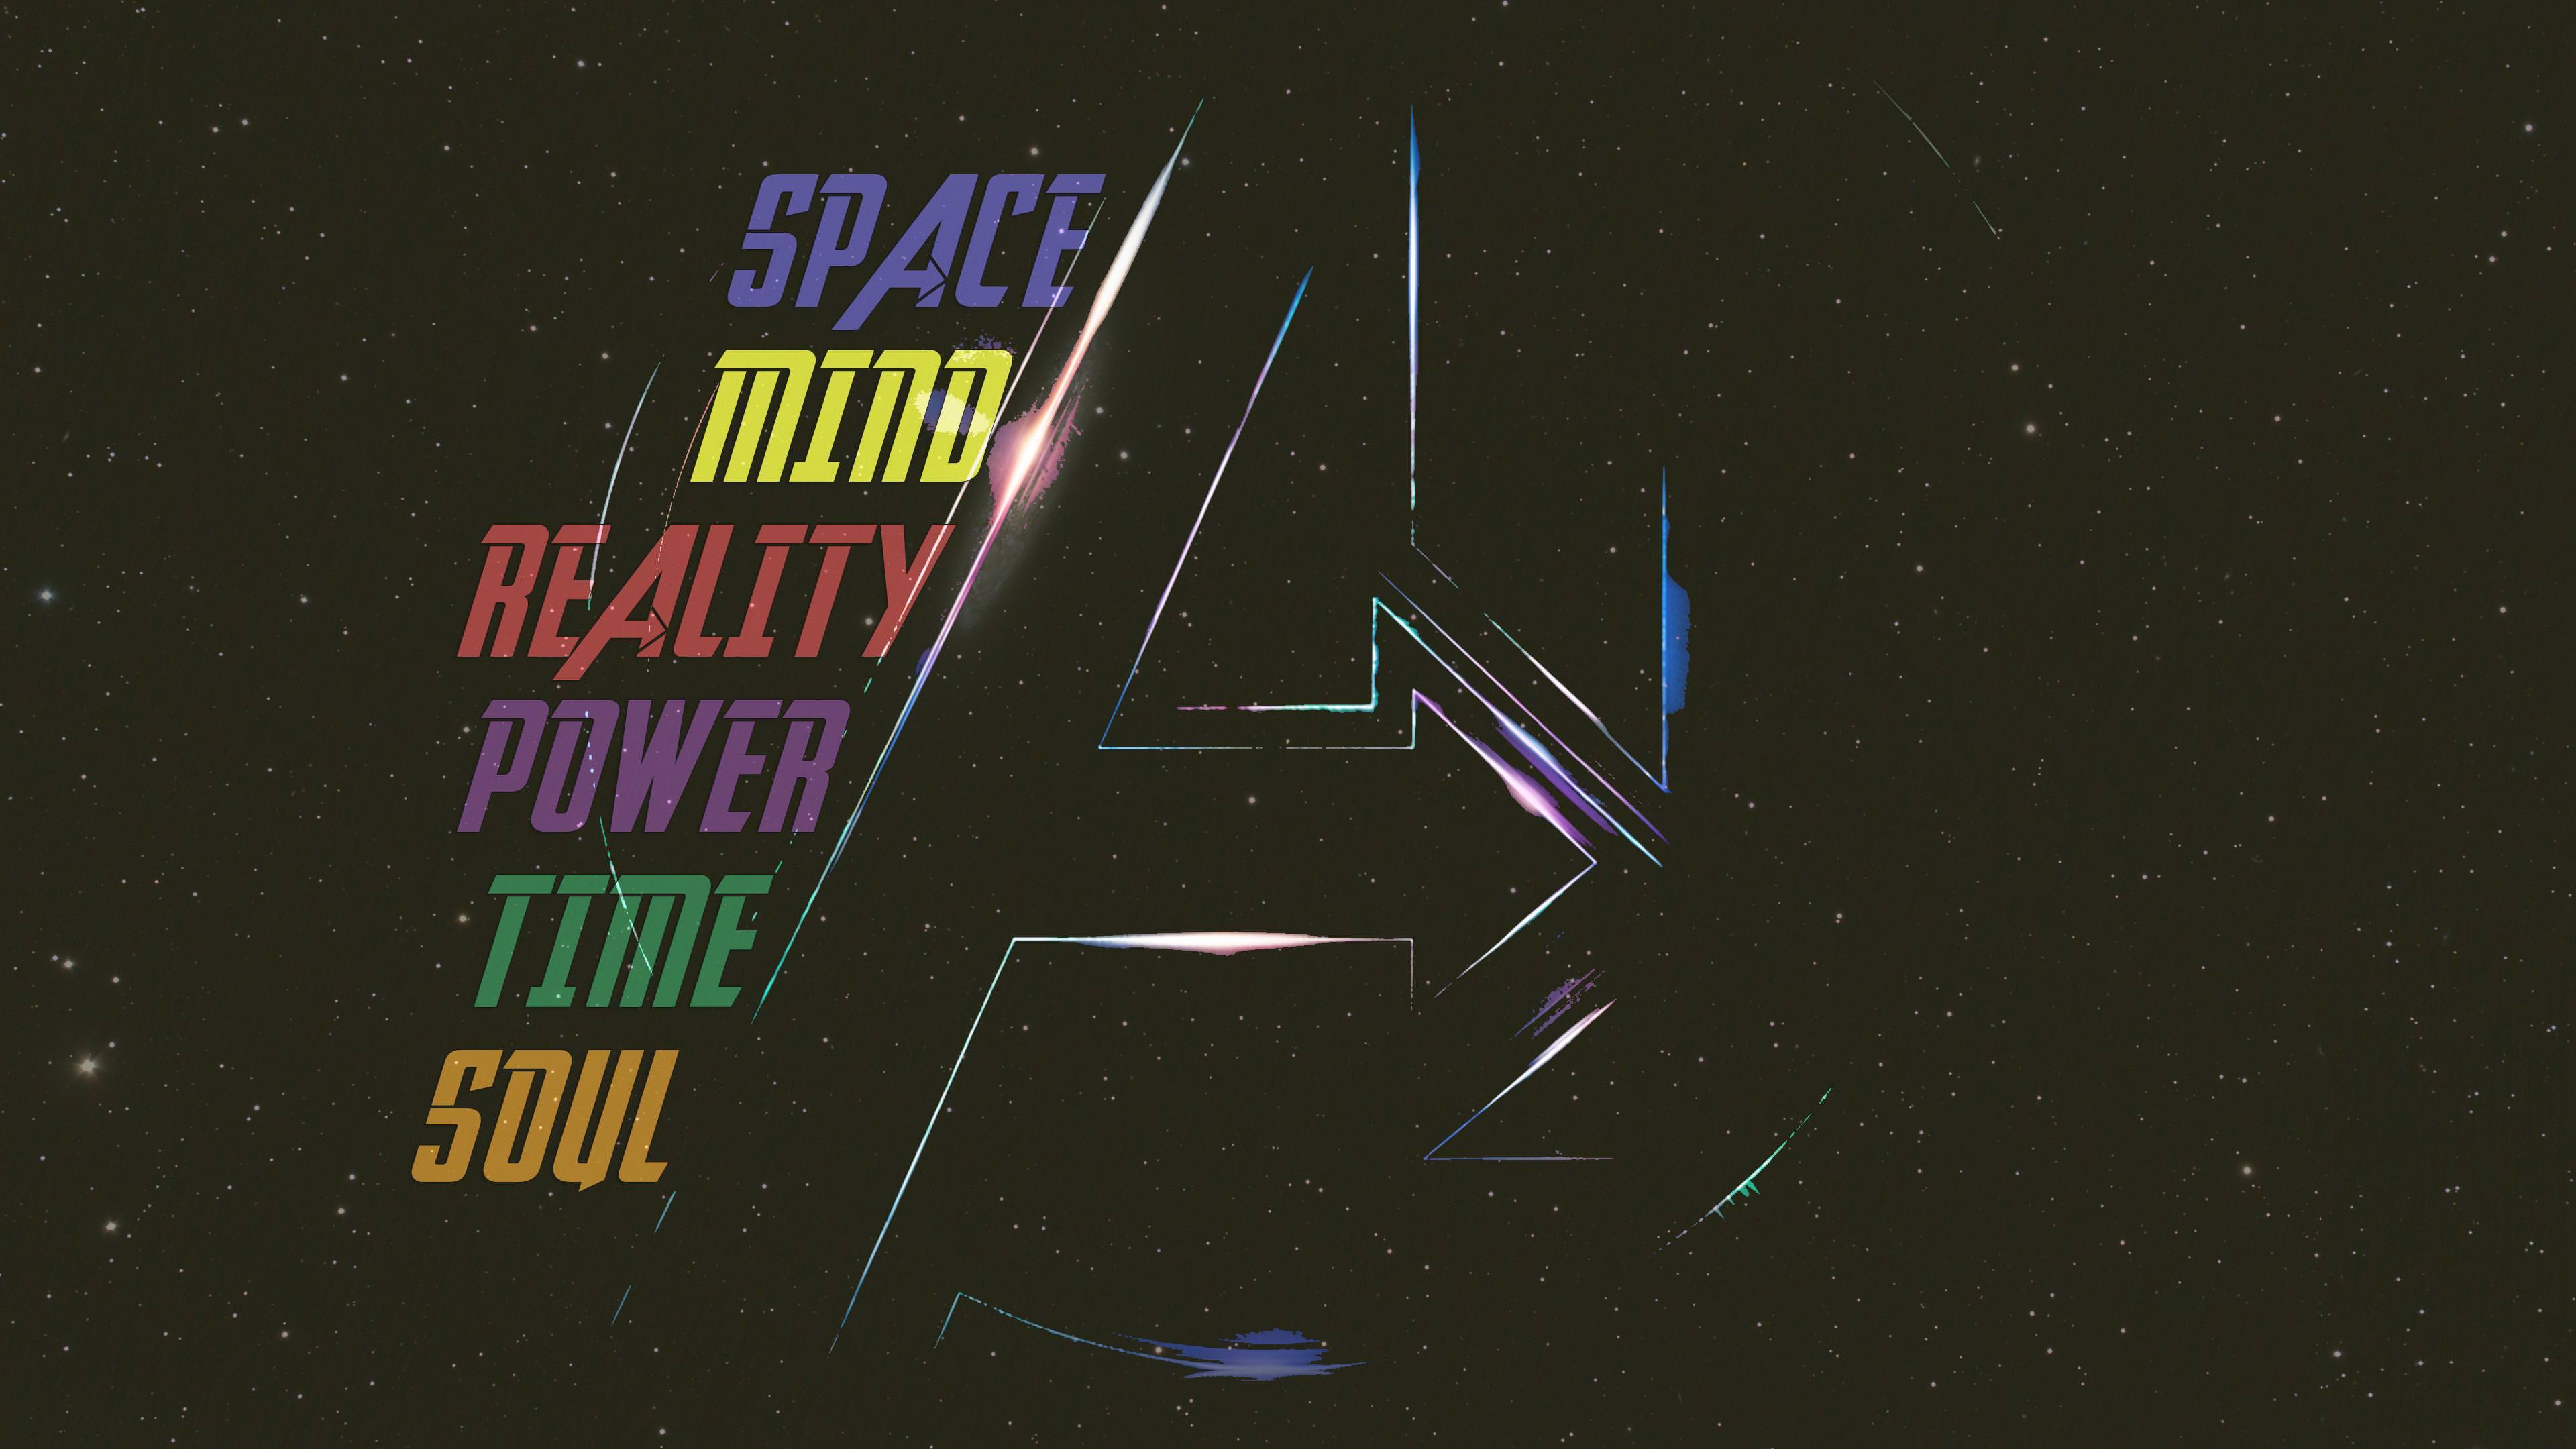 avengers infinity war stone names 1537644289 - Avengers Infinity War Stone Names - movies wallpapers, infinity-war-wallpapers, hd-wallpapers, avengers-wallpapers, avengers-infinity-war-wallpapers, 4k-wallpapers, 2018-movies-wallpapers